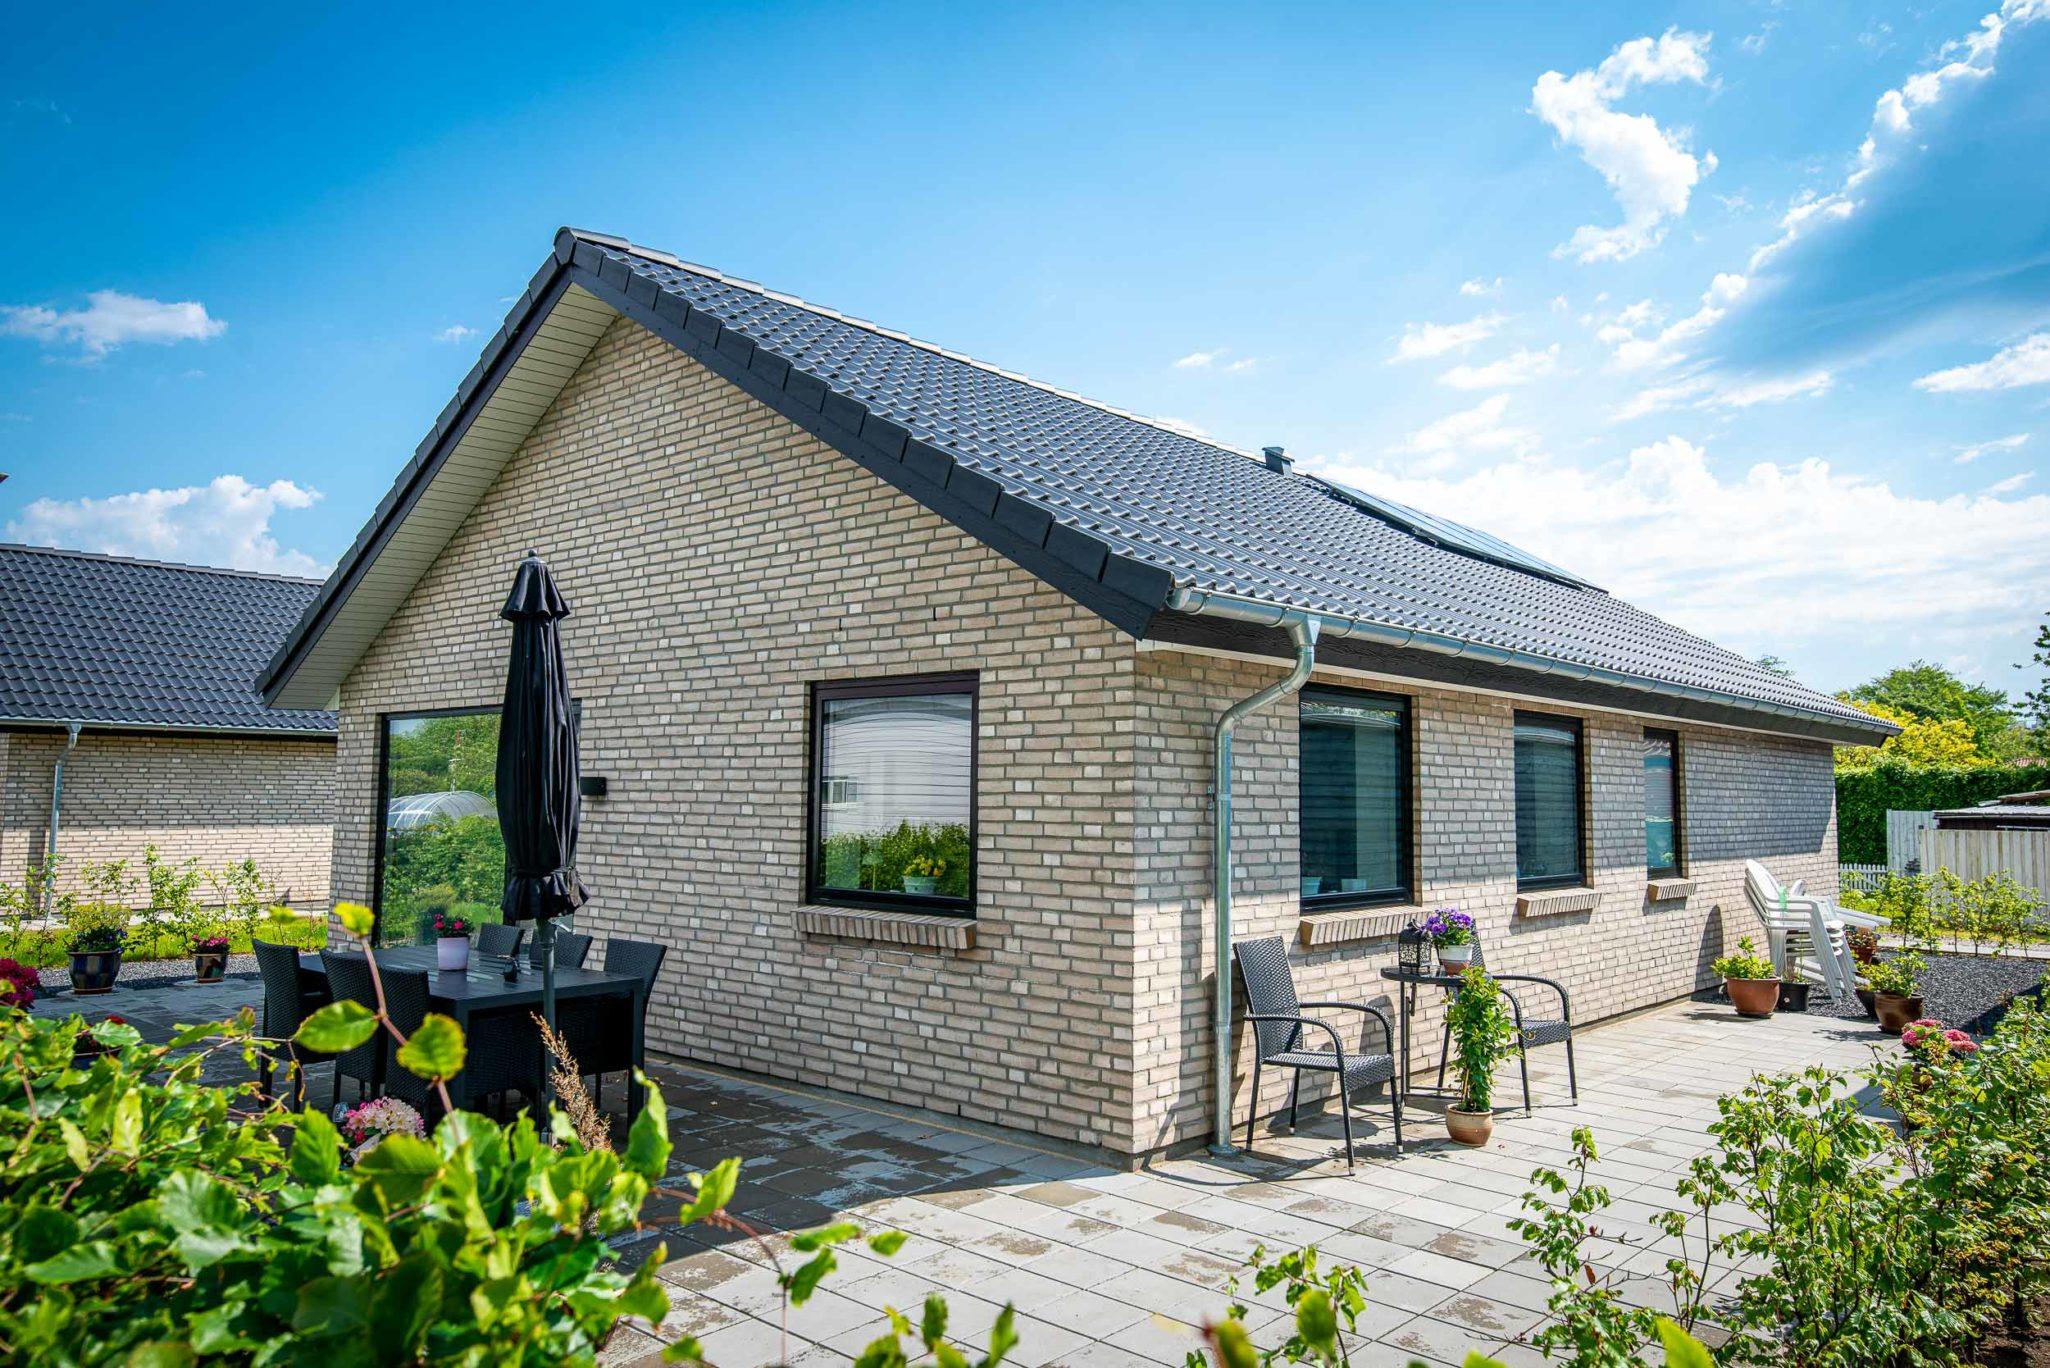 Arkitekttegnet familiehuse i Brørup